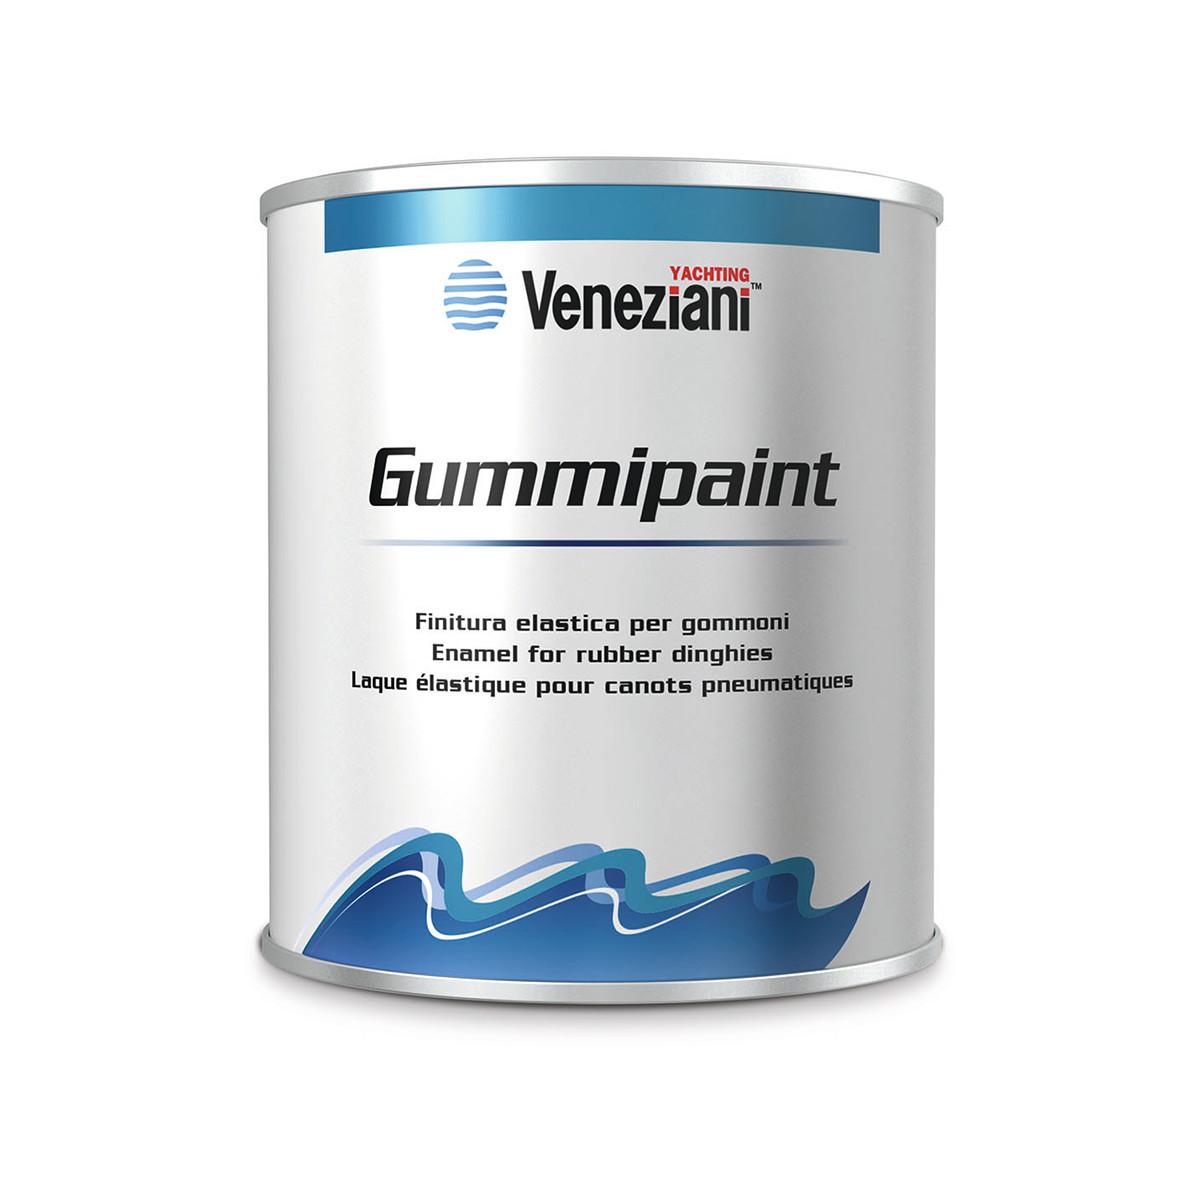 Veneziani Gummipaint lak voor opblaasbare boten - rood 311, 500ml